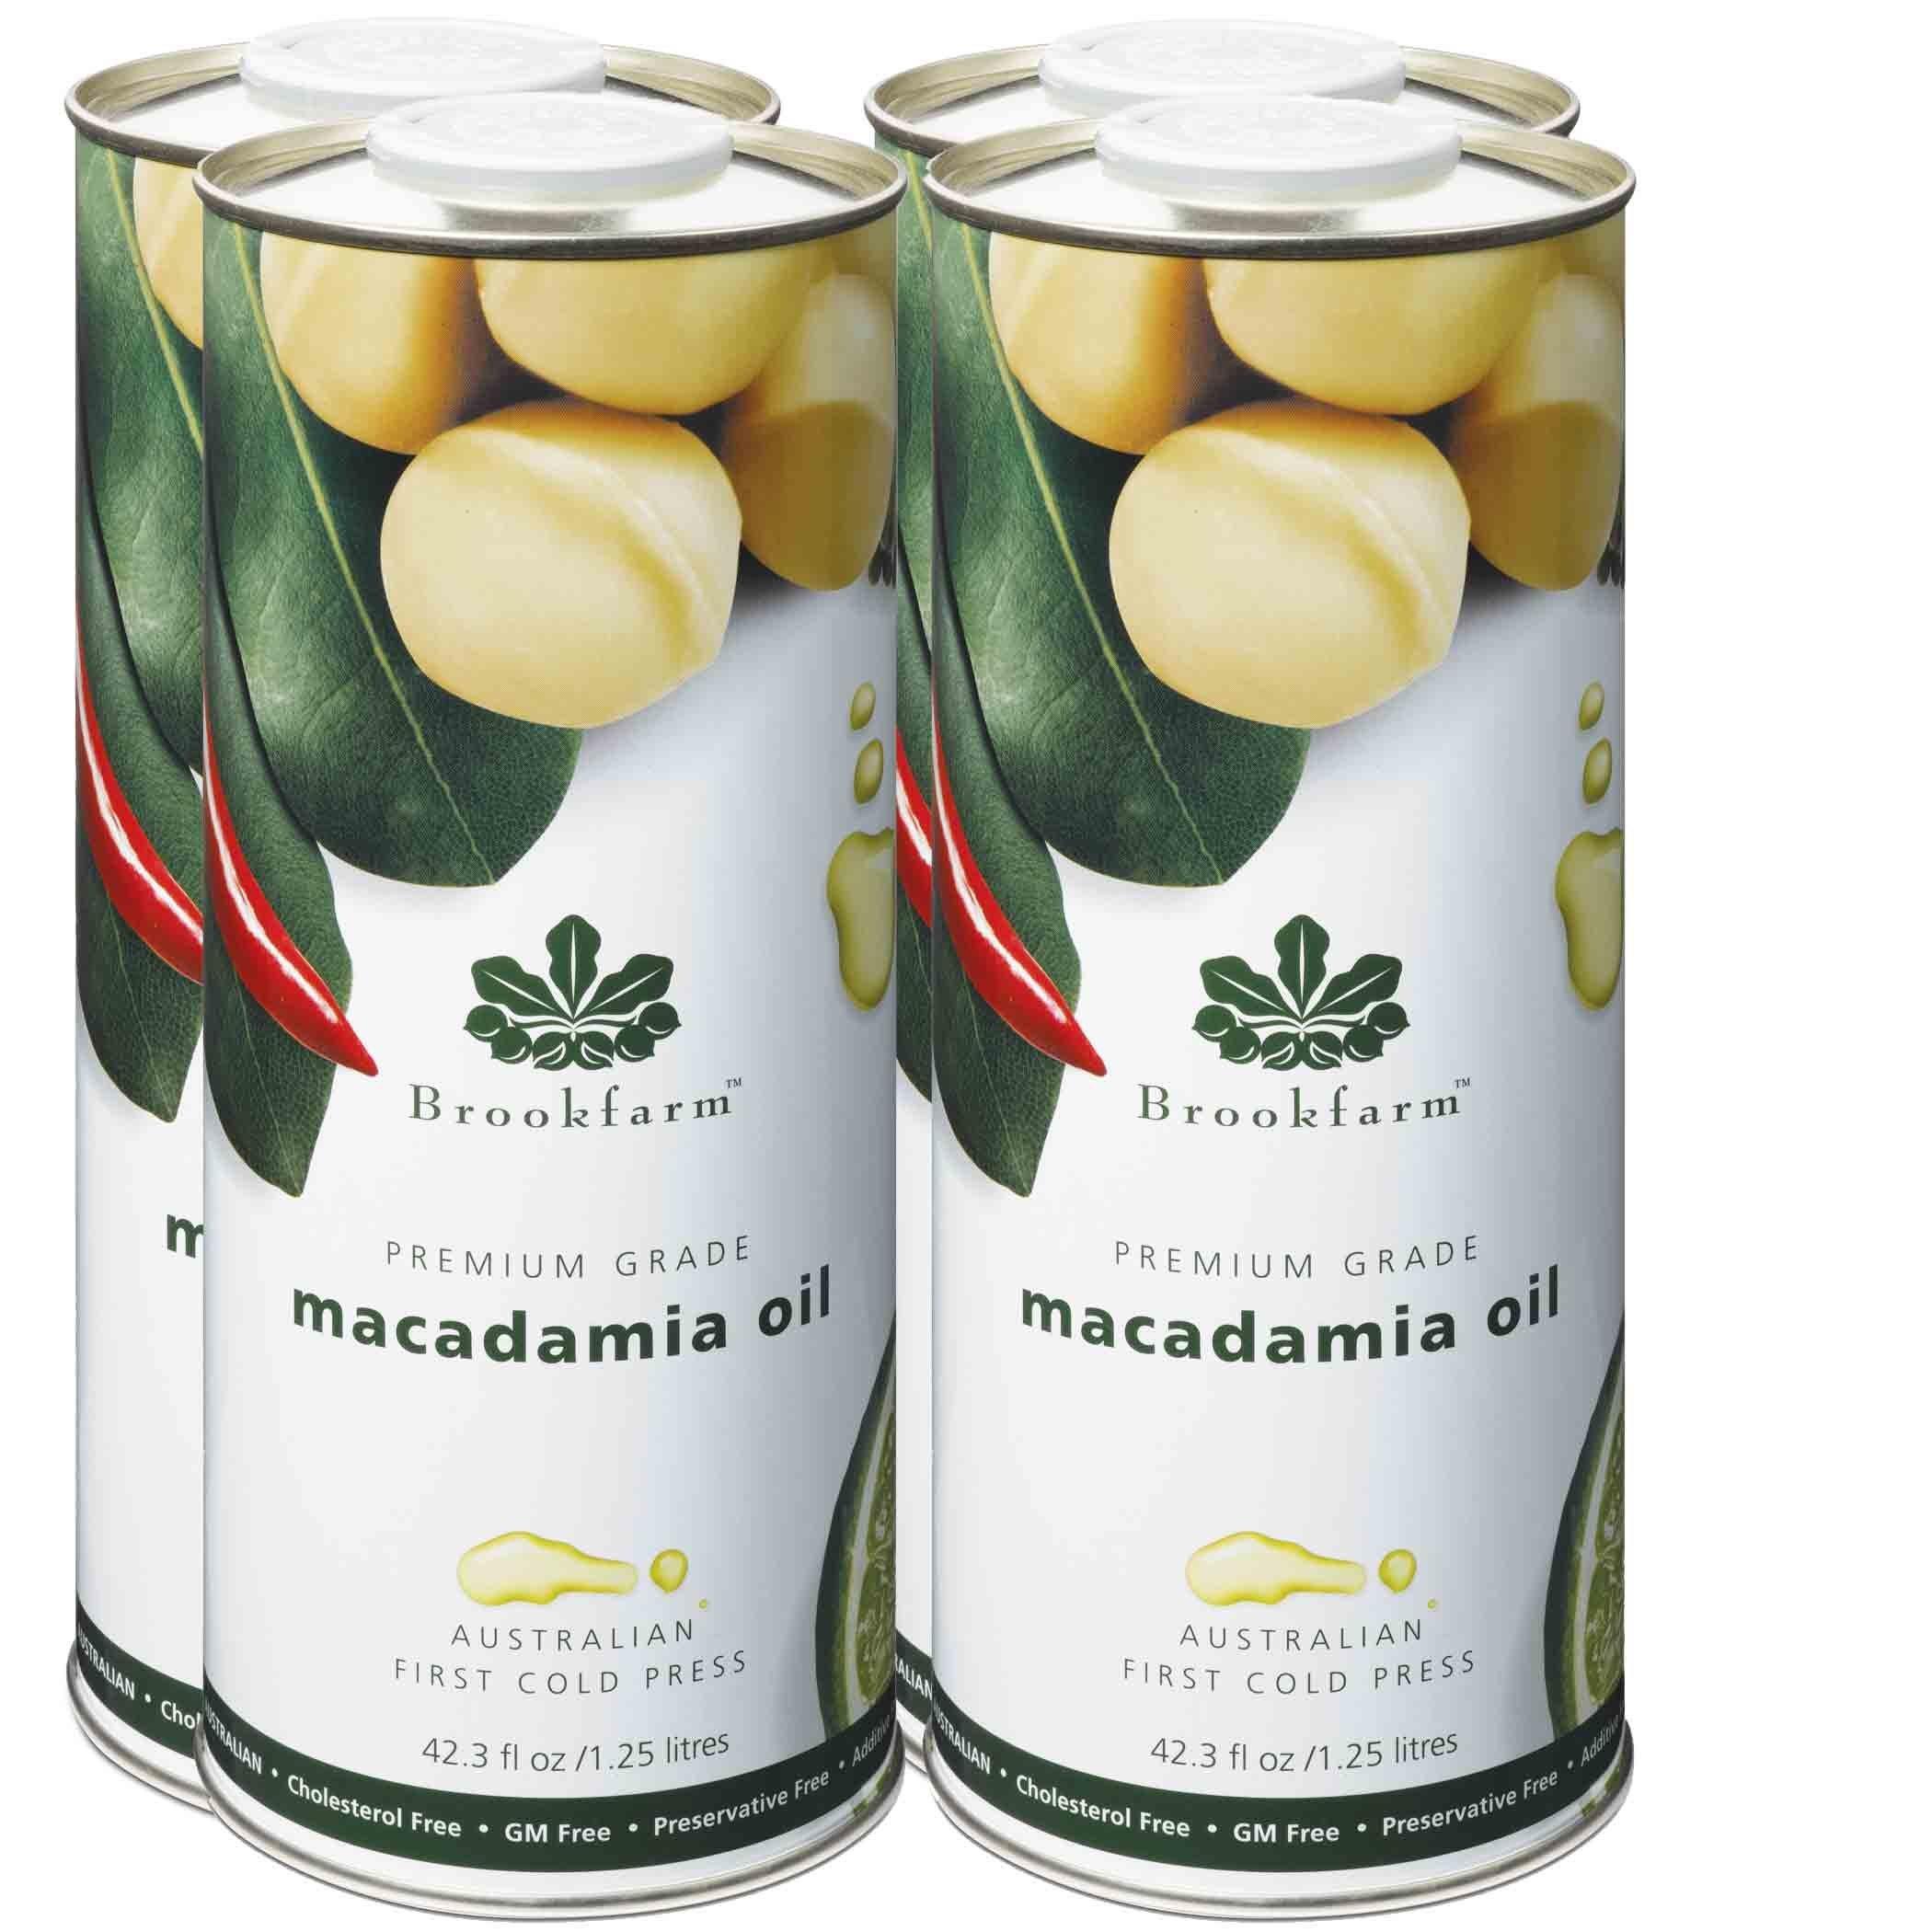 Brookfarm Natural Macadamia Oil, Premium-Grade 43.3 fl oz (1.25l), 4-Pack by Brookfarm